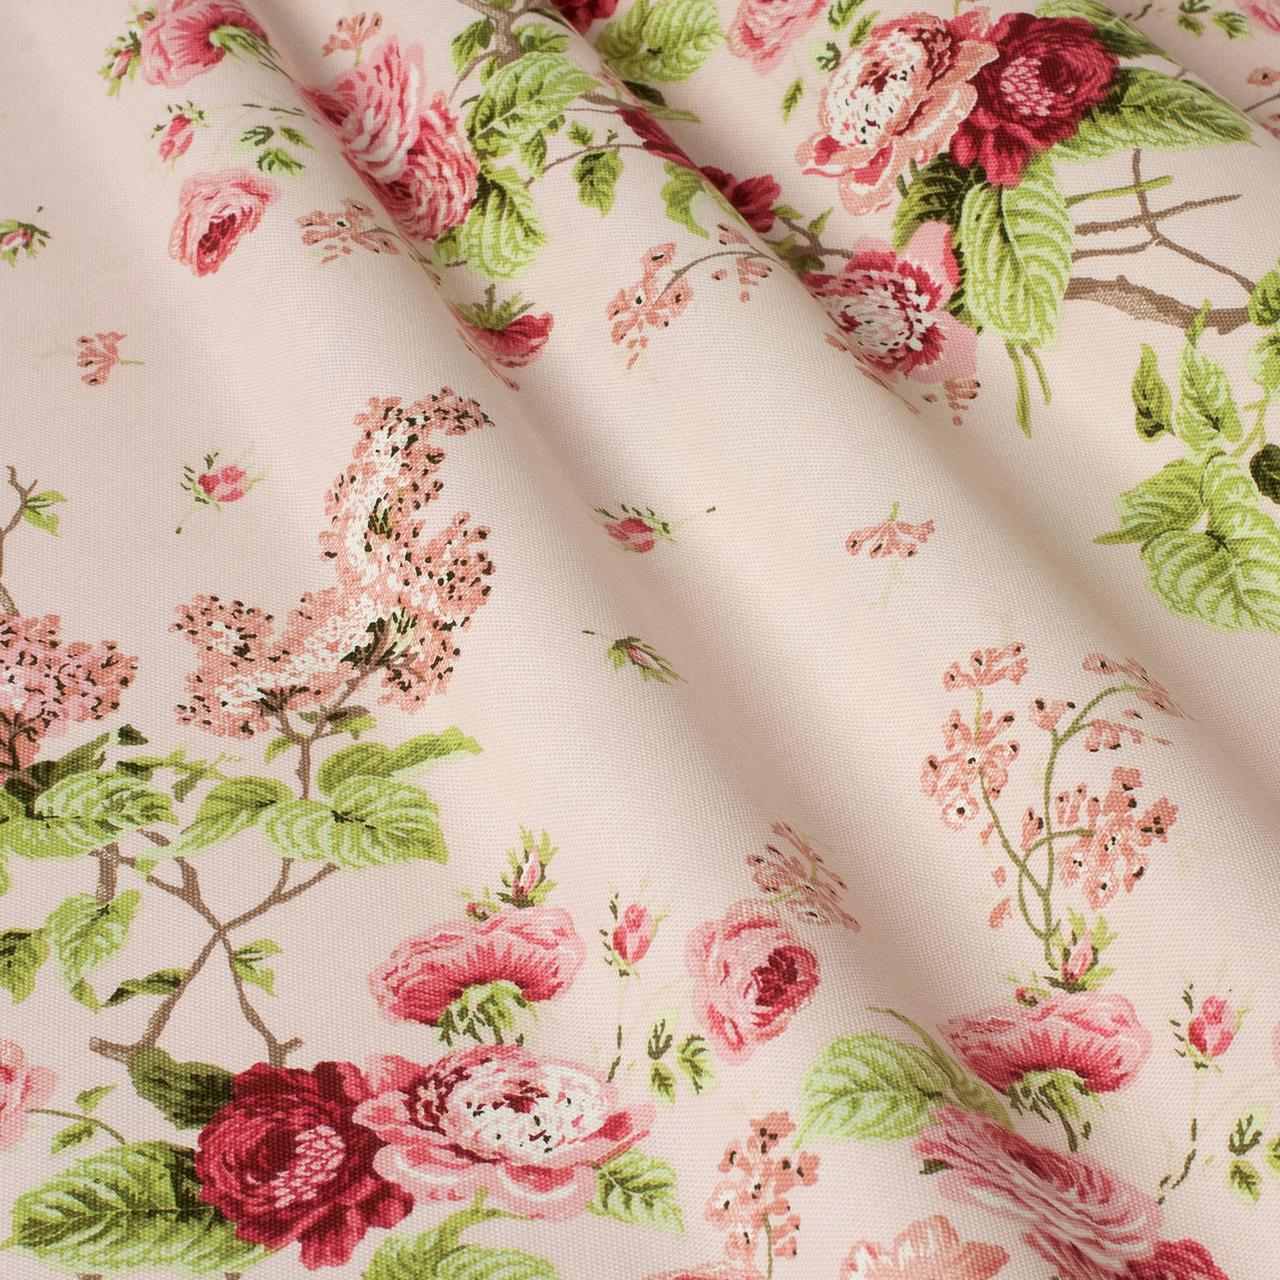 Декоративная ткань цветы на розовом фоне Турция 87980v16